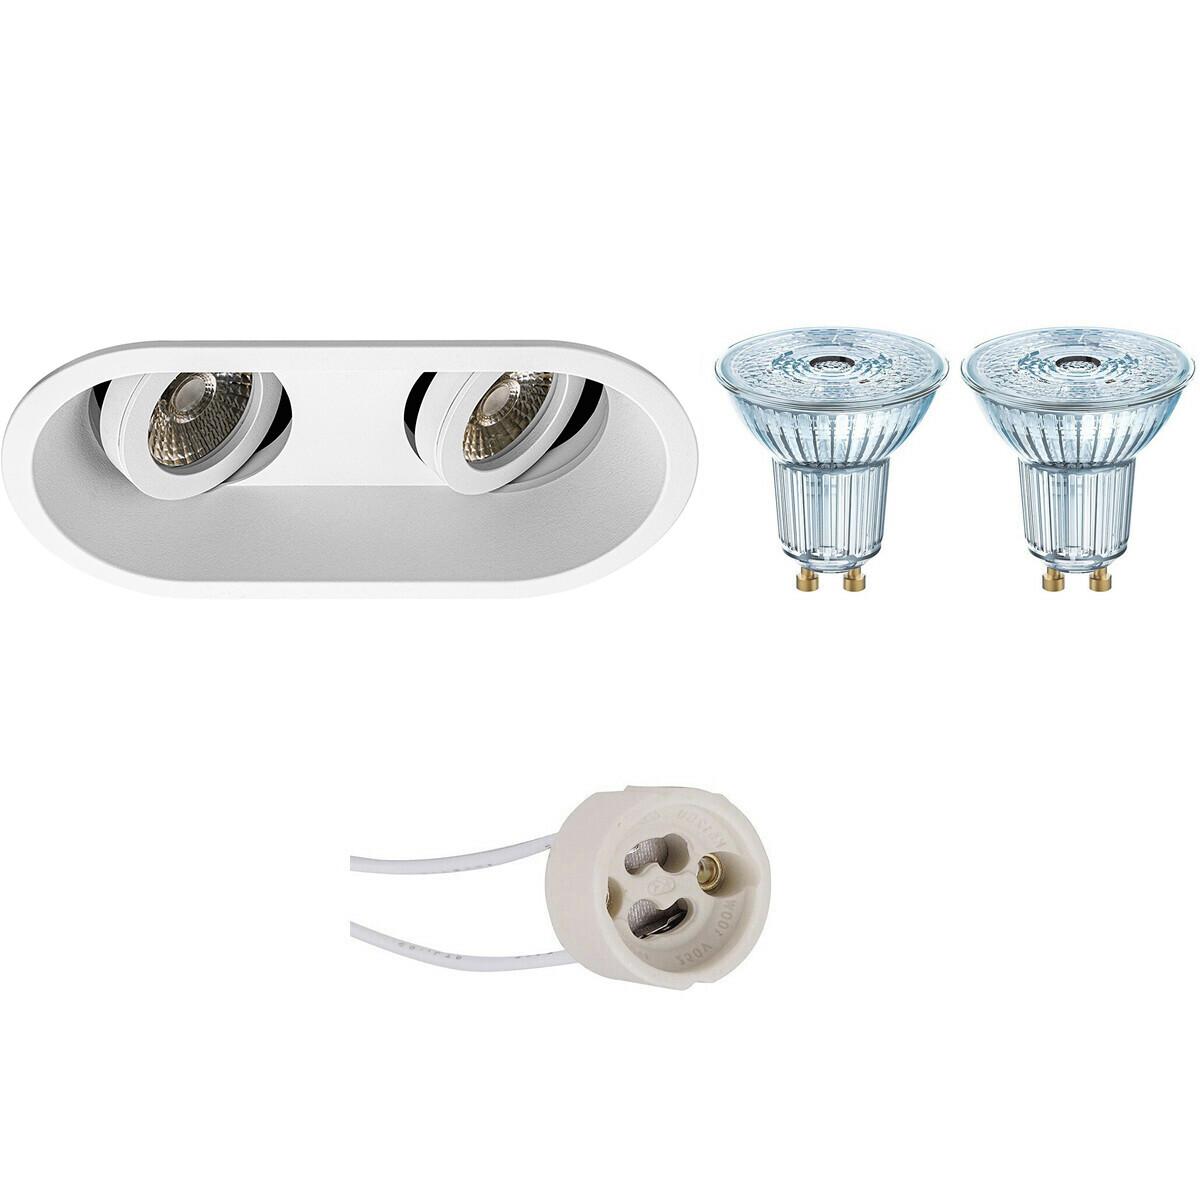 OSRAM - LED Spot Set - Parathom PAR16 930 36D - Pragmi Zano Pro - GU10 Fitting - Dimbaar - Inbouw Ov